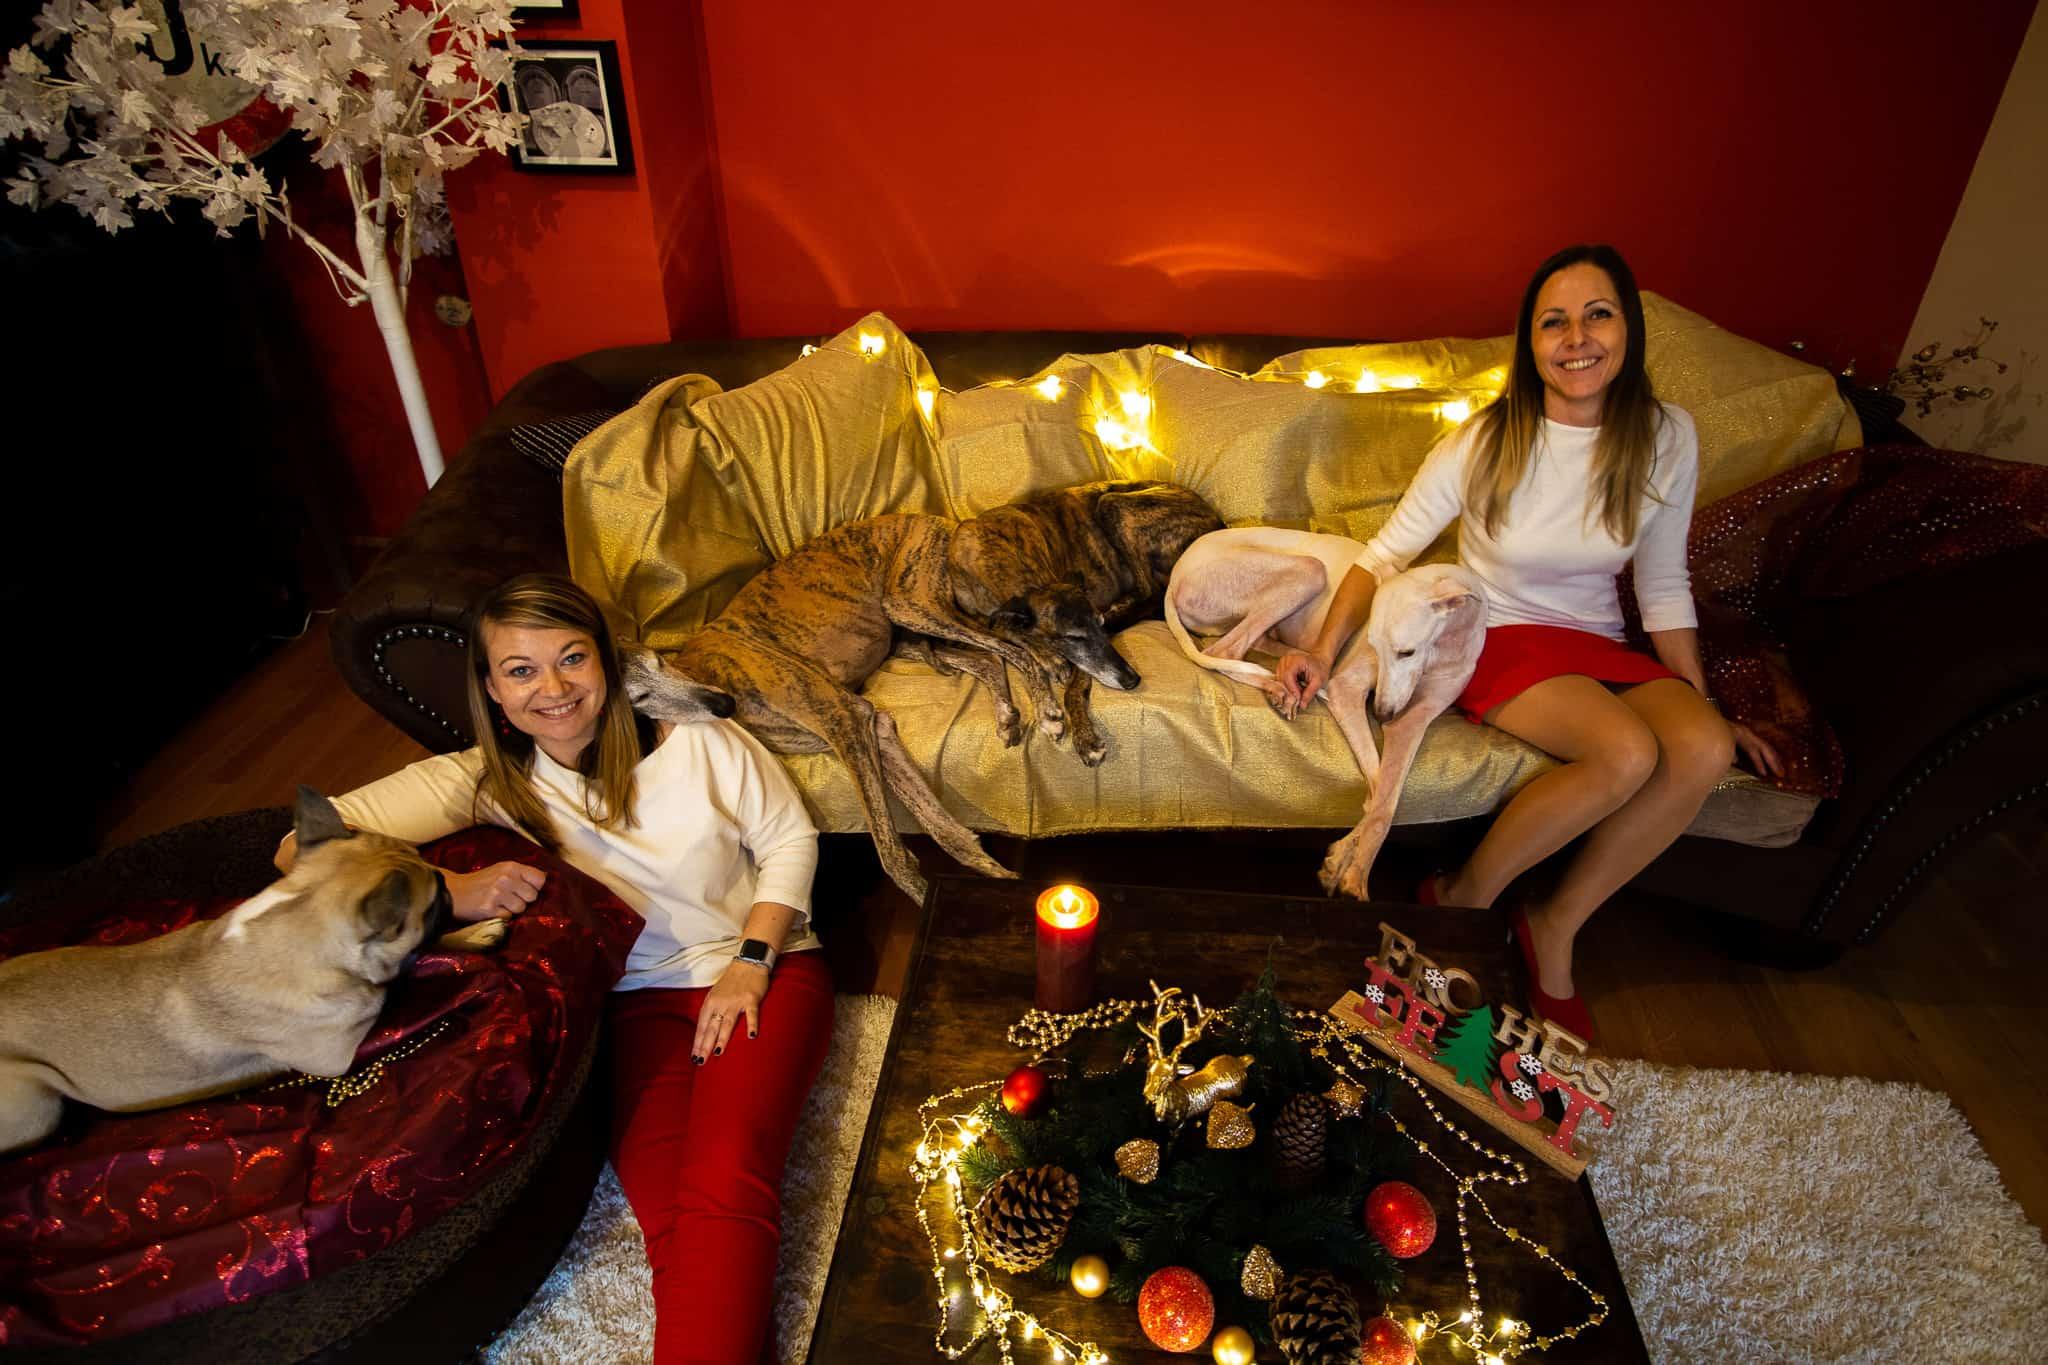 Team Hundereise Frohe Weihnachten